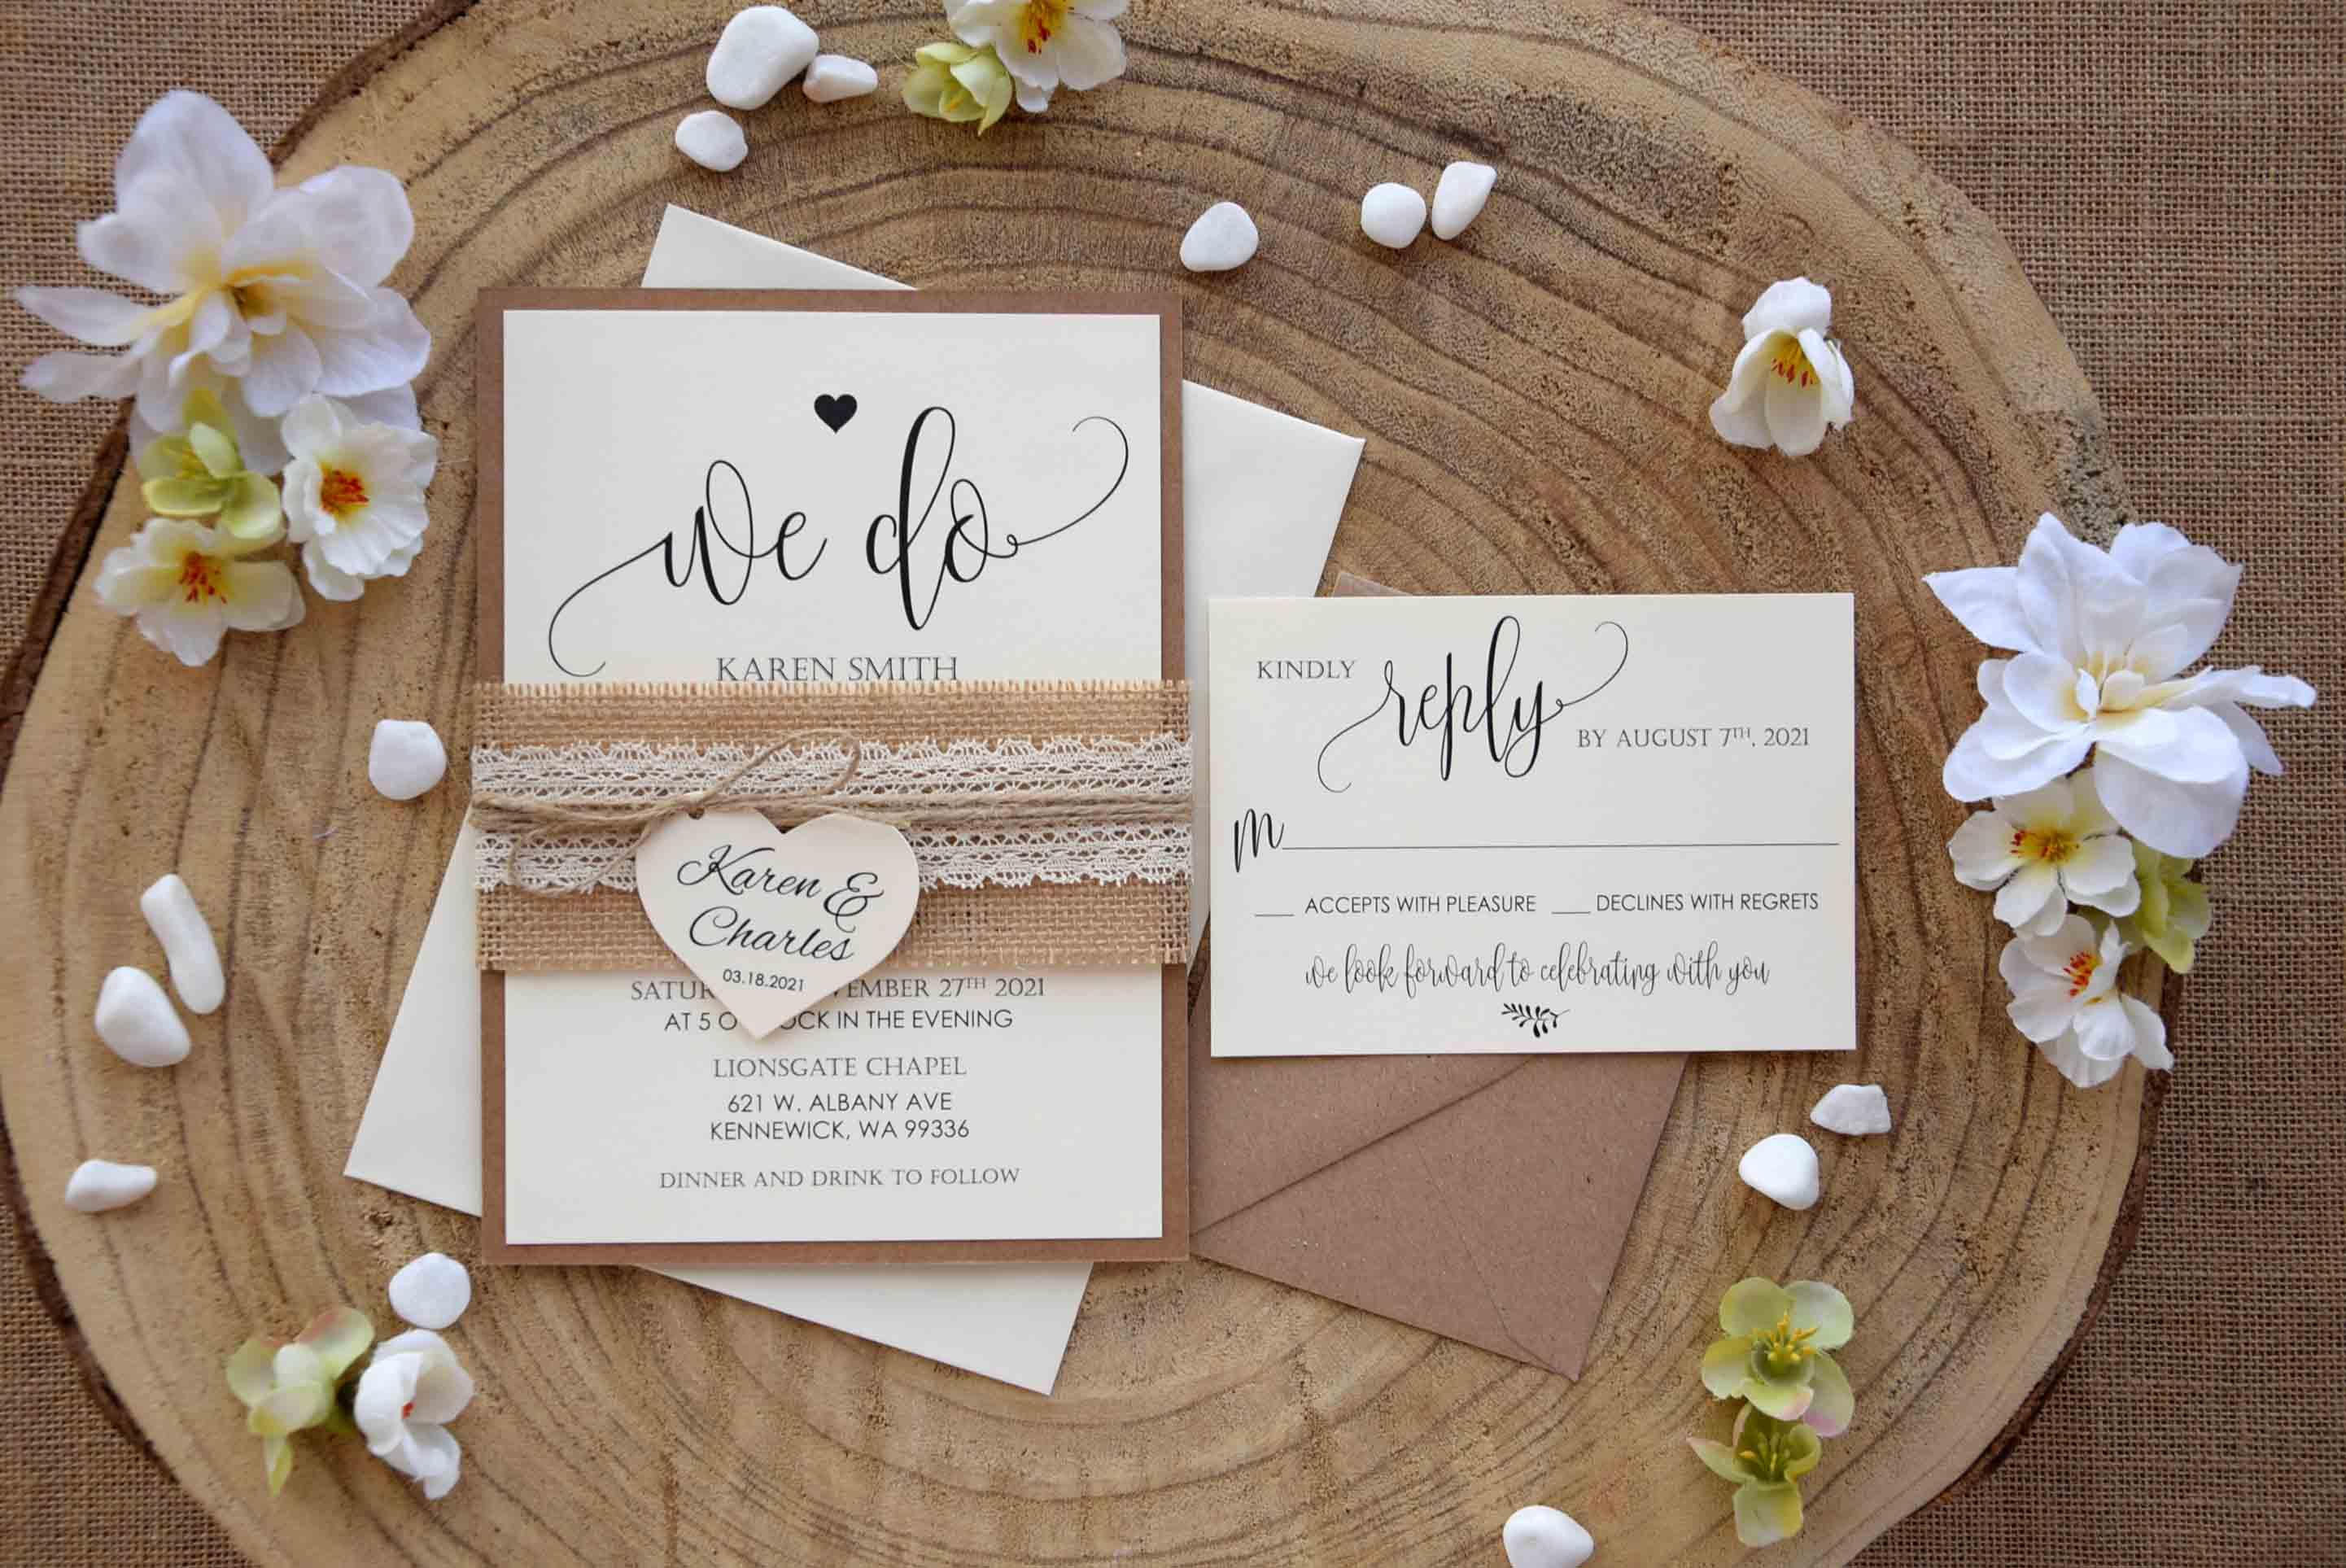 10 WHITE LARGE FLOWER LASER CUT CARD TOPPER EMBELLISHMENTS IDEAL WEDDING INVITE